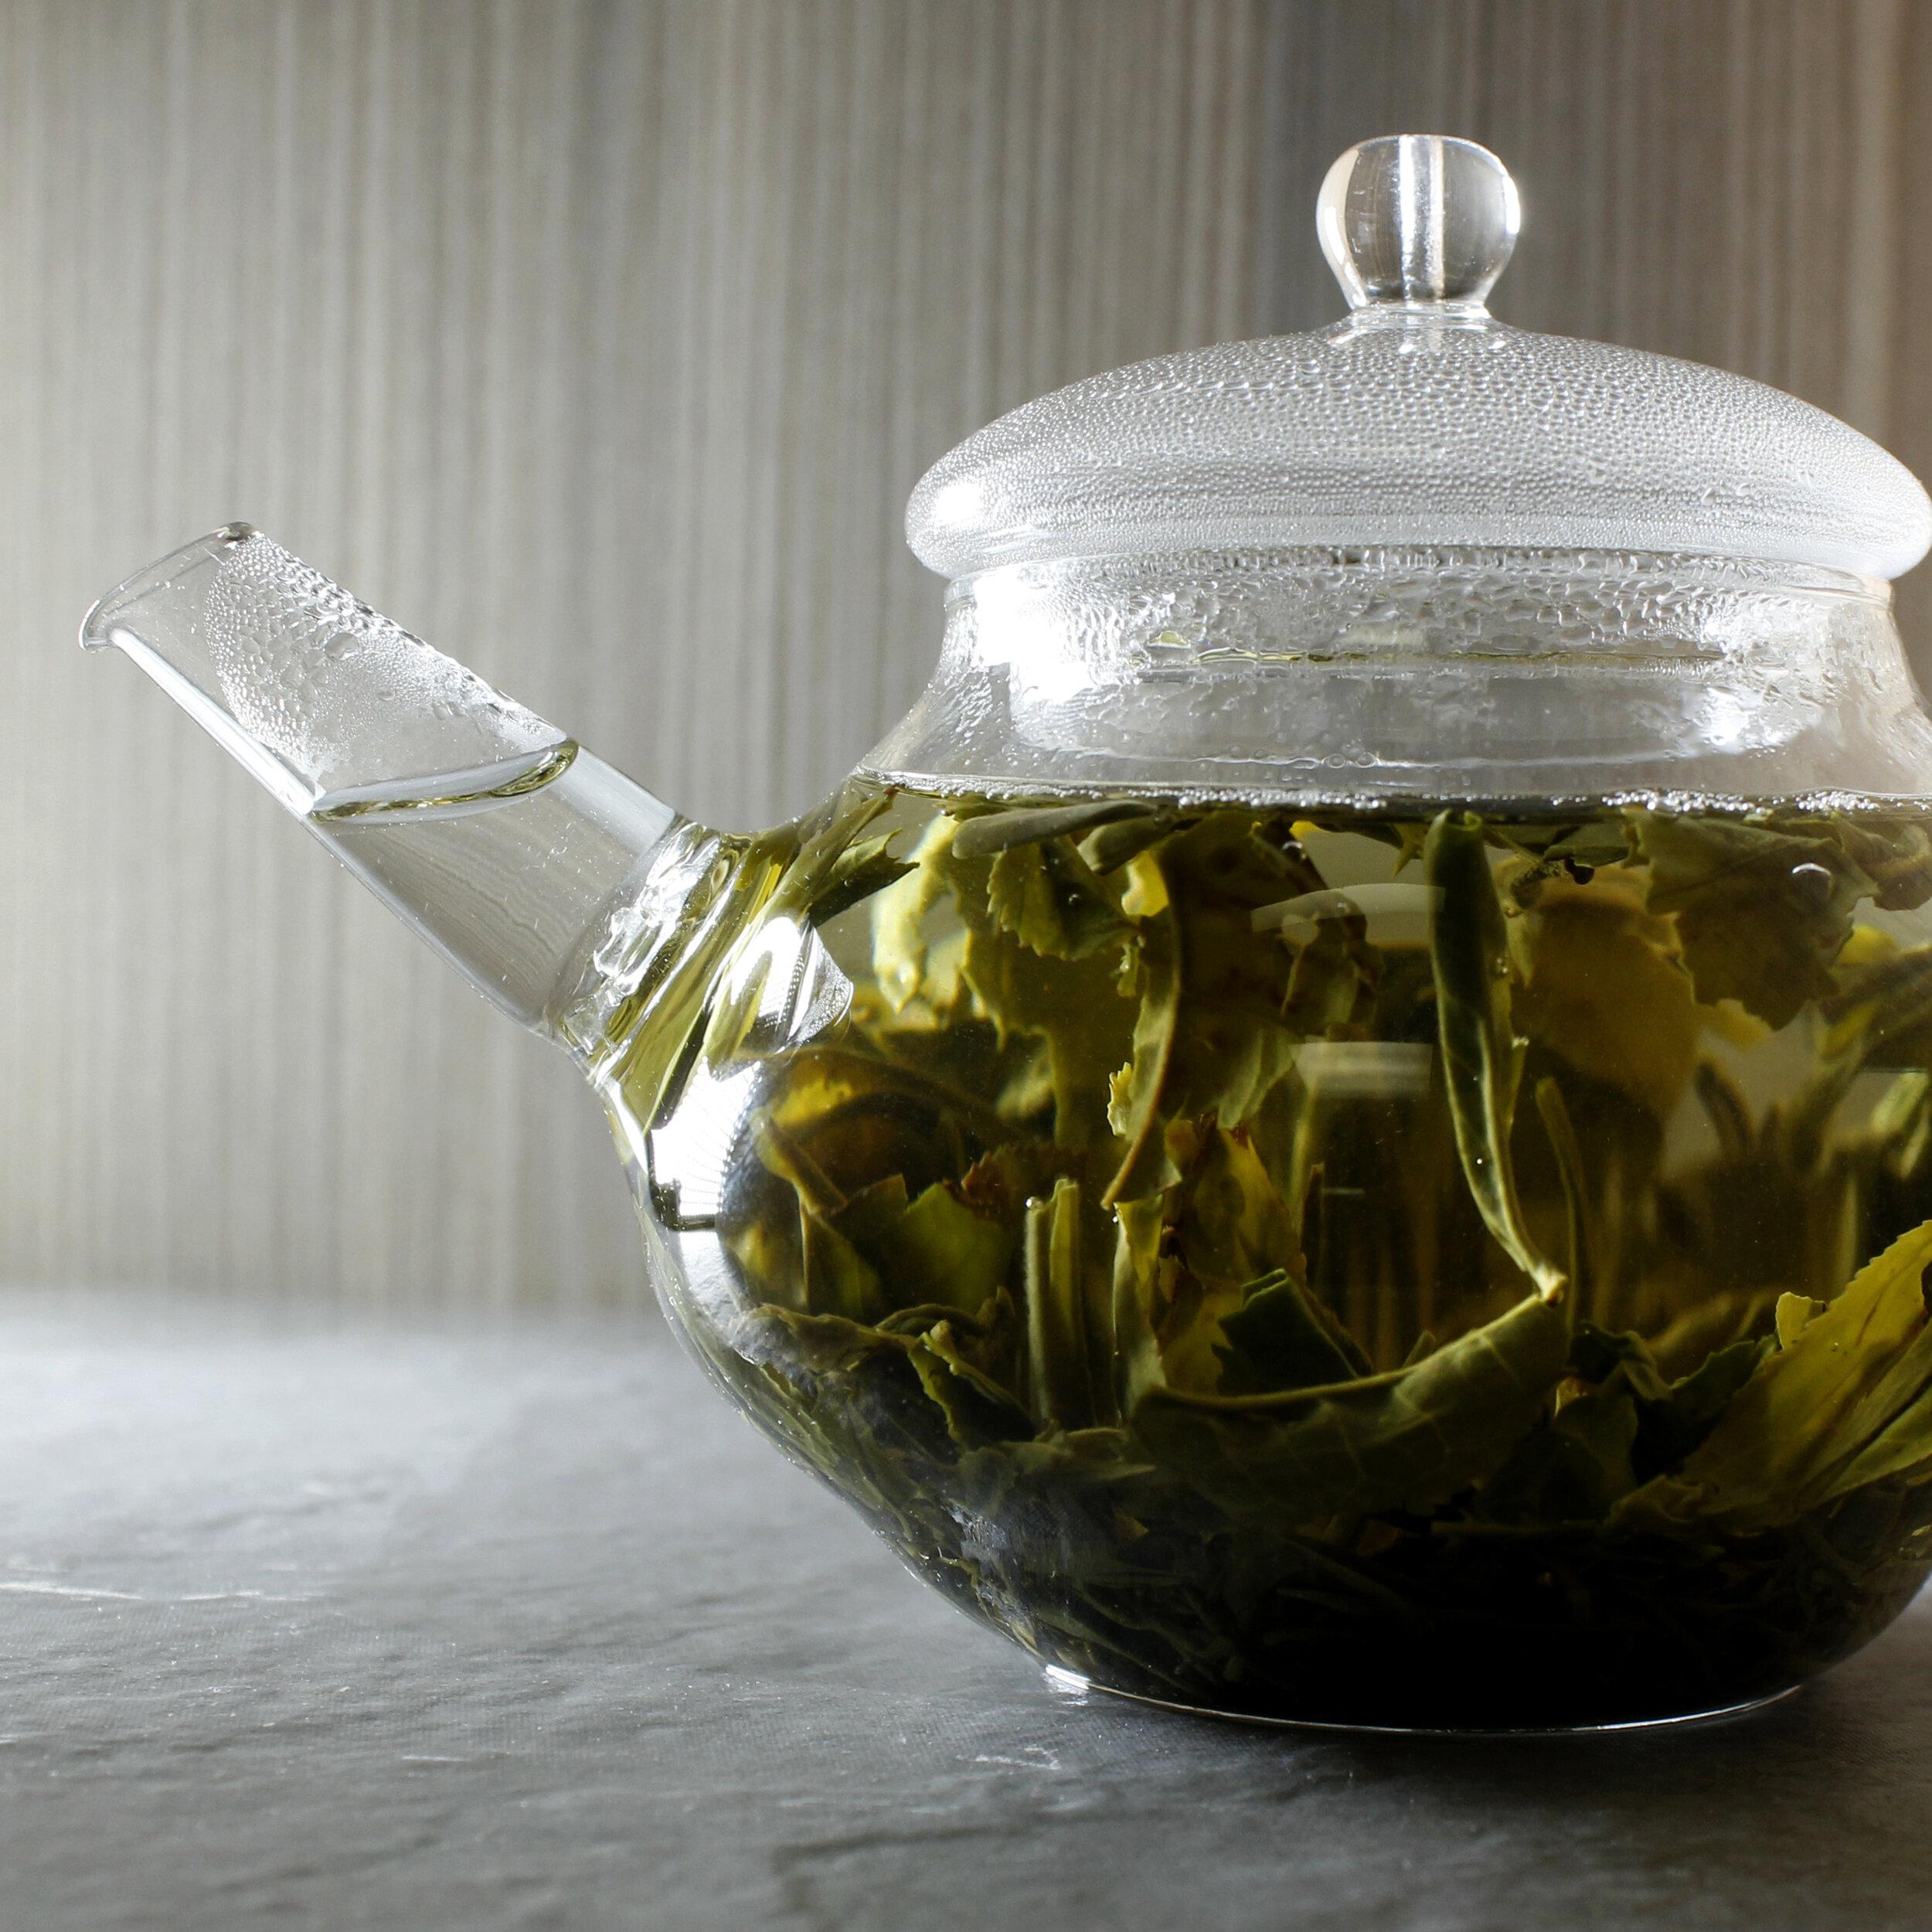 green-silk-hunan-china-green-whole-leaf-loose-mem-tea-itw1-2019a.jpg